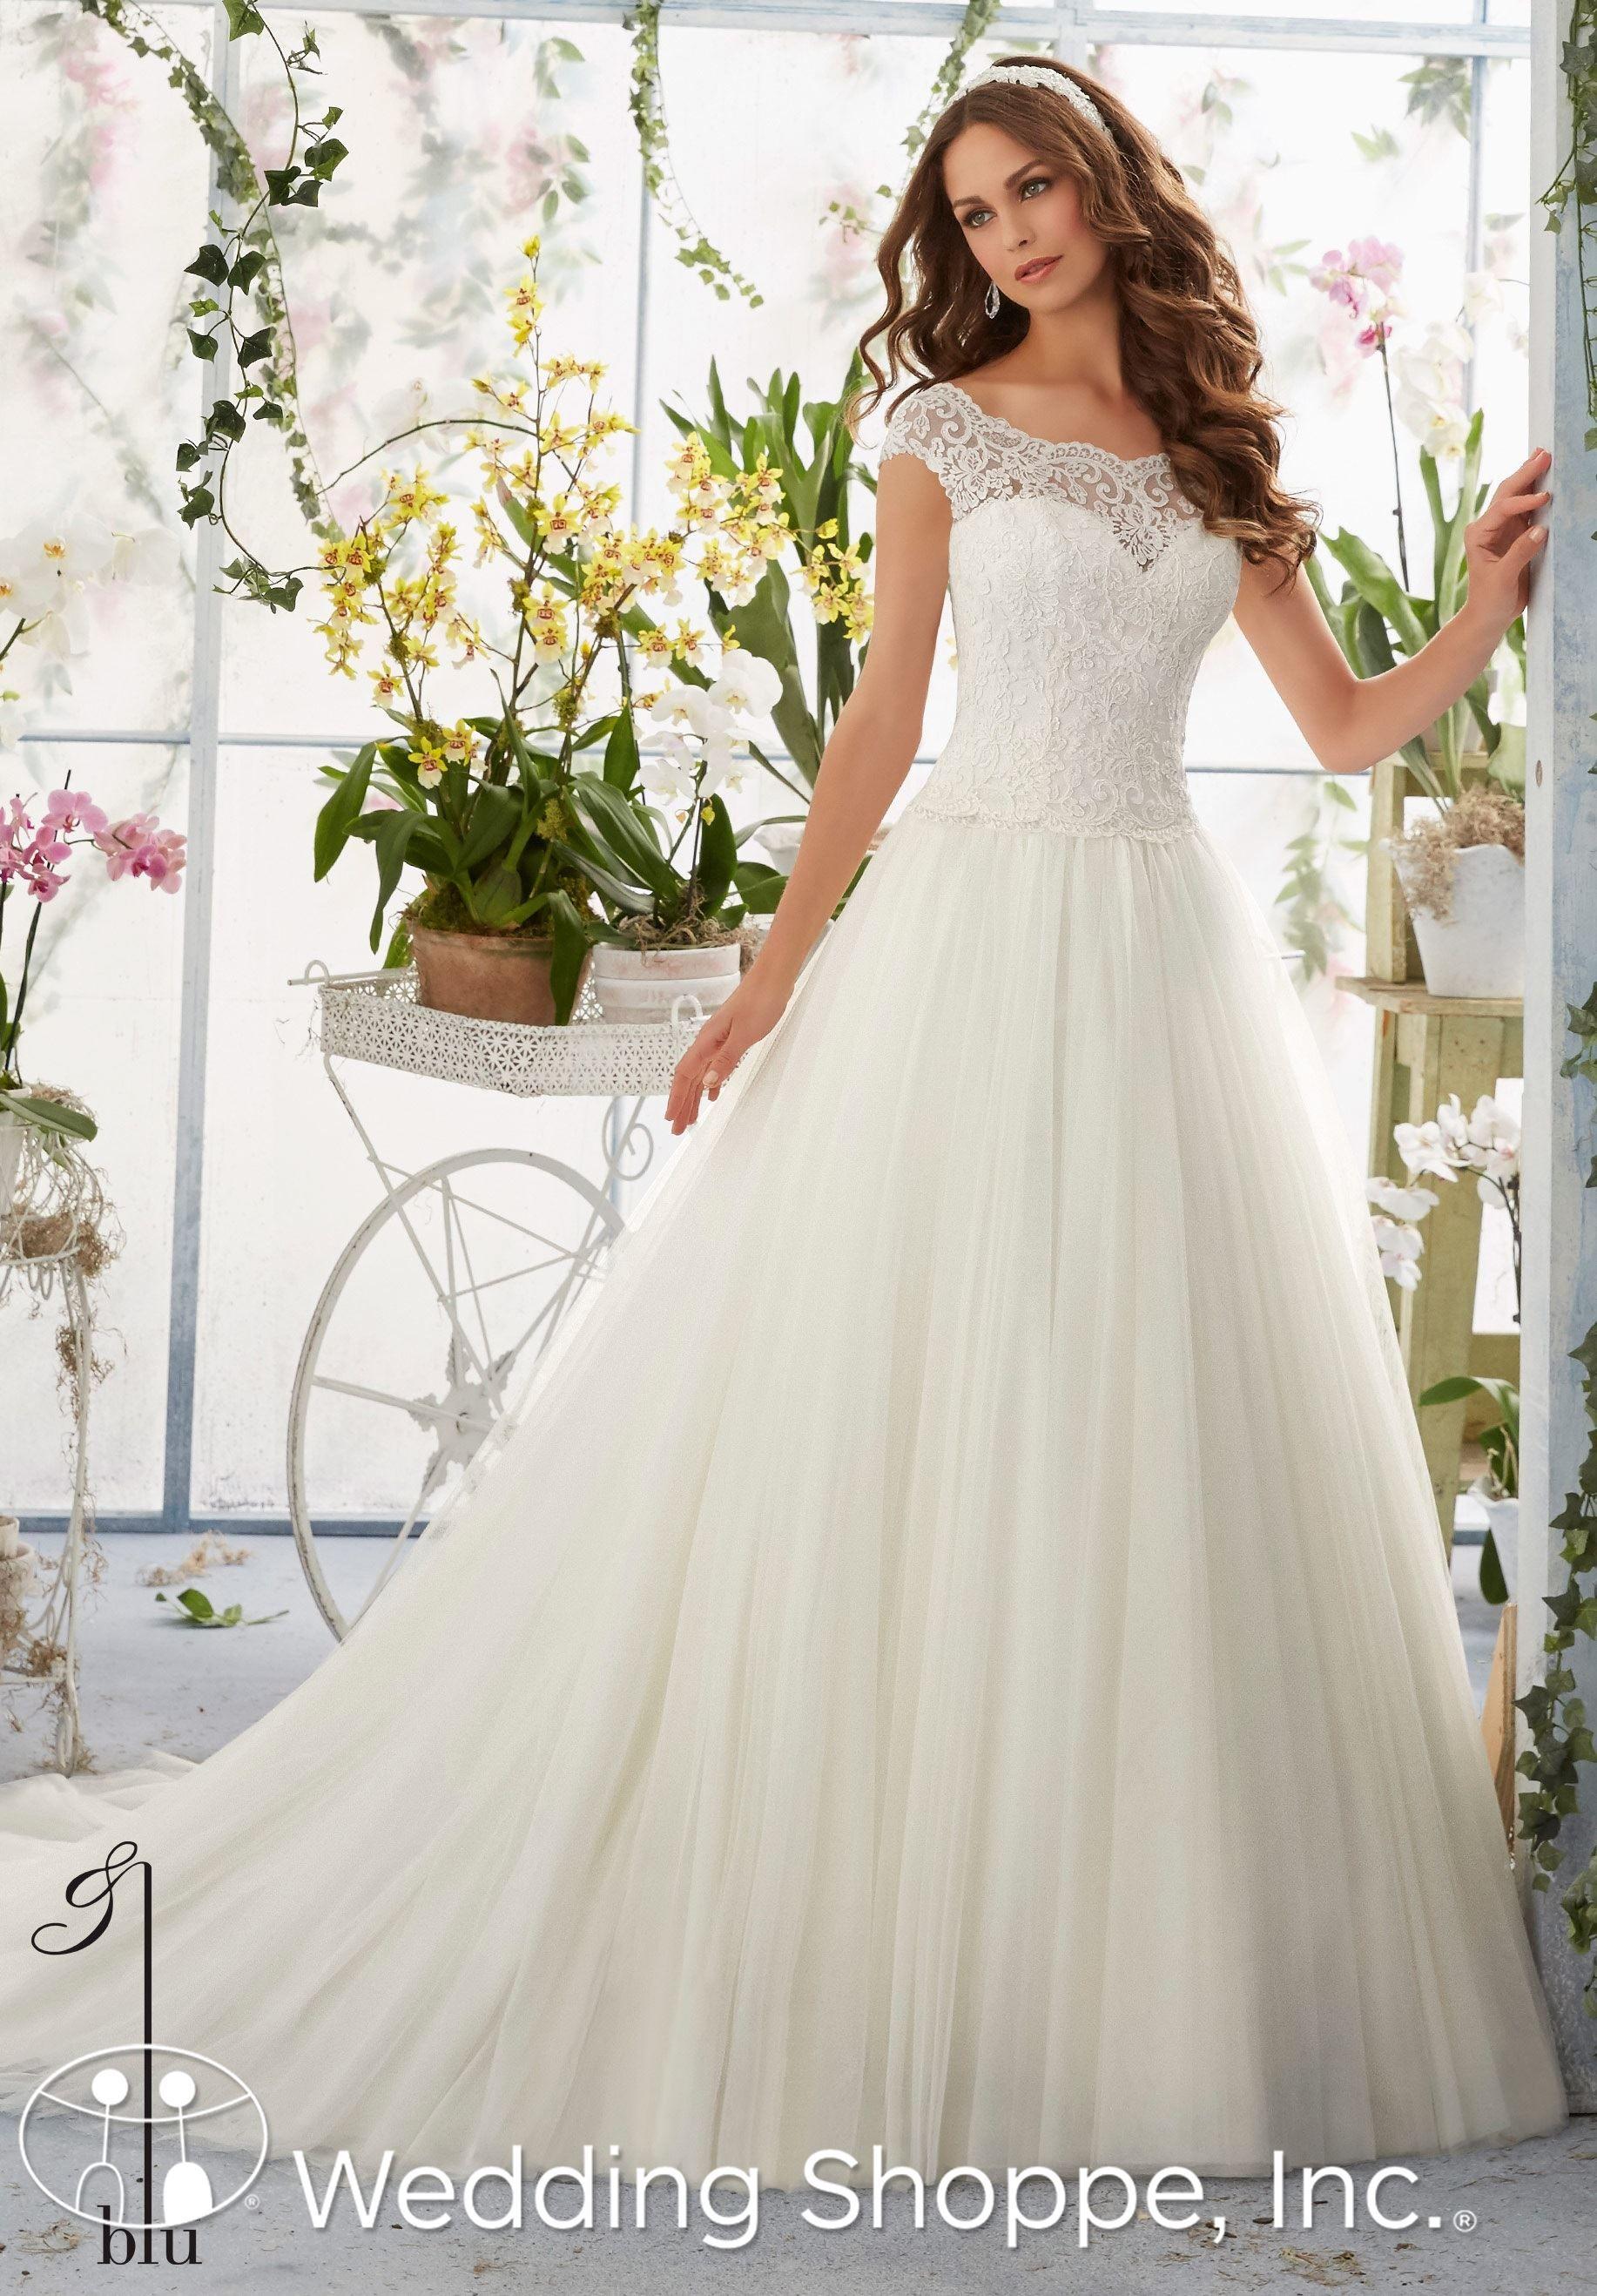 Blu by Mori Lee Bridal Gown 5403 | Member Board: Bride & Bridal ...